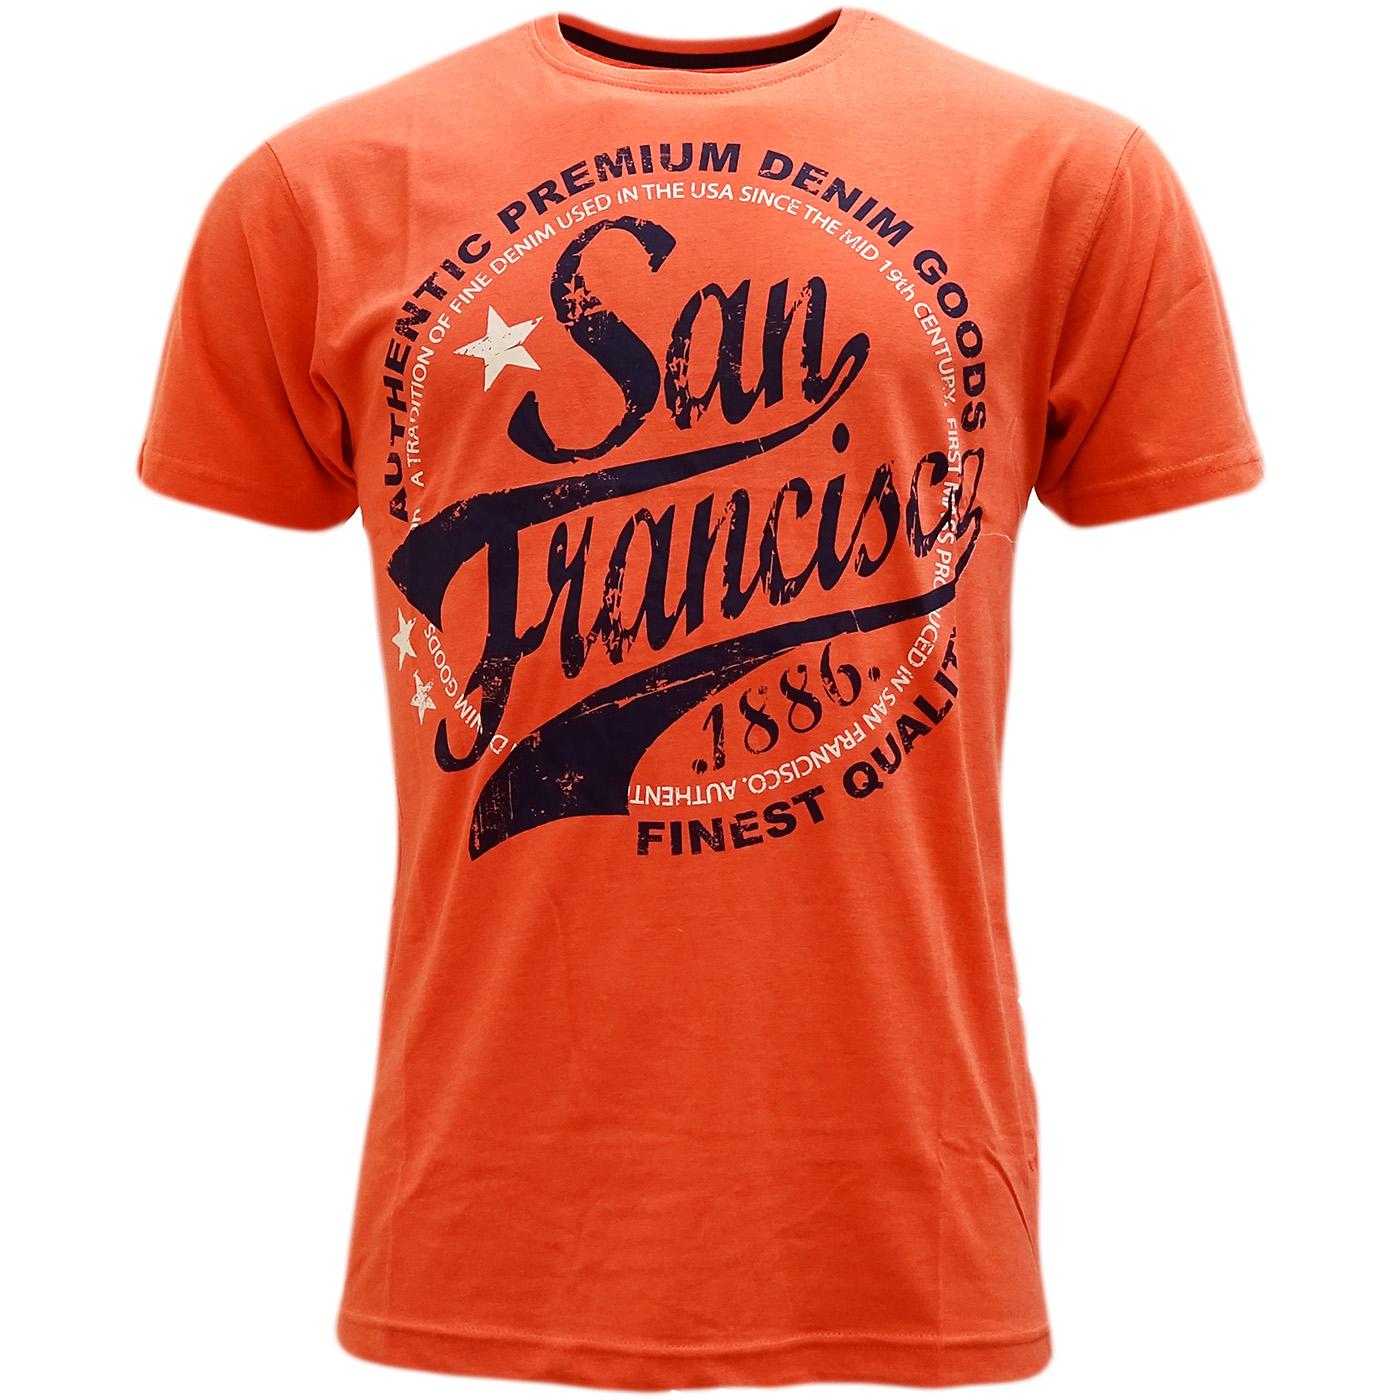 Cargo Designer Top T Shirt San Francisco Cargo Mr H